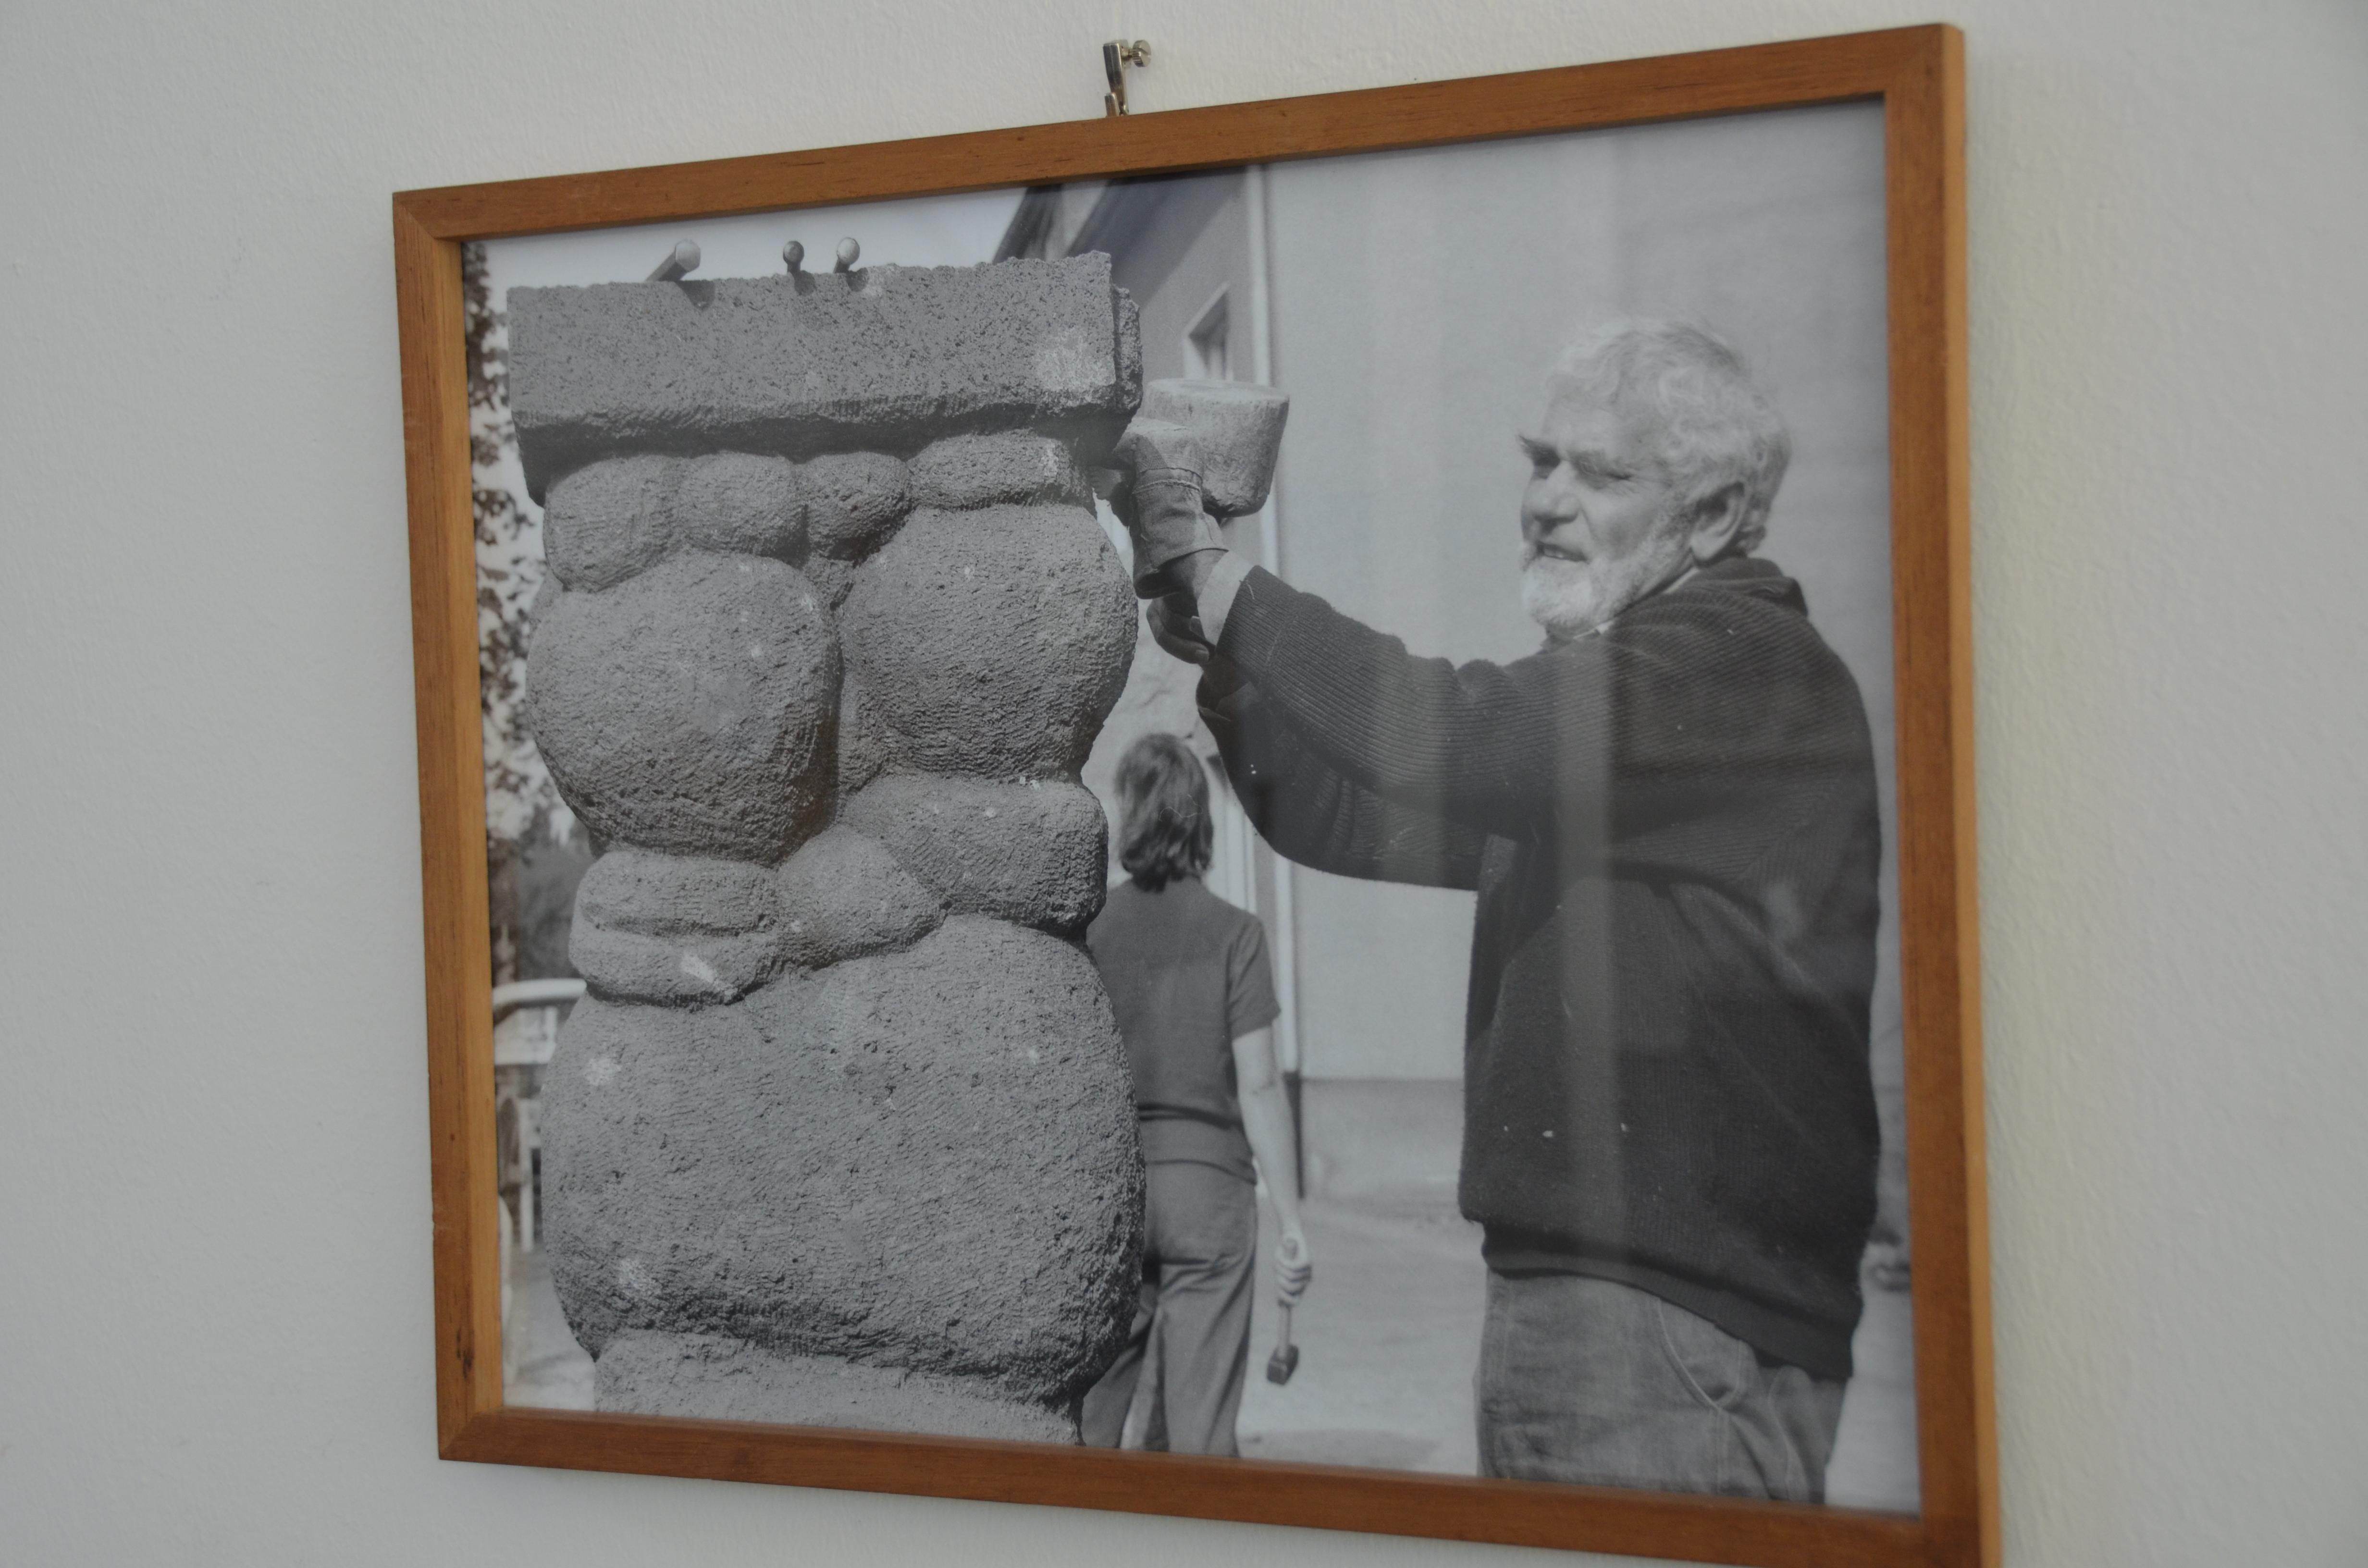 Johannes Reinarz